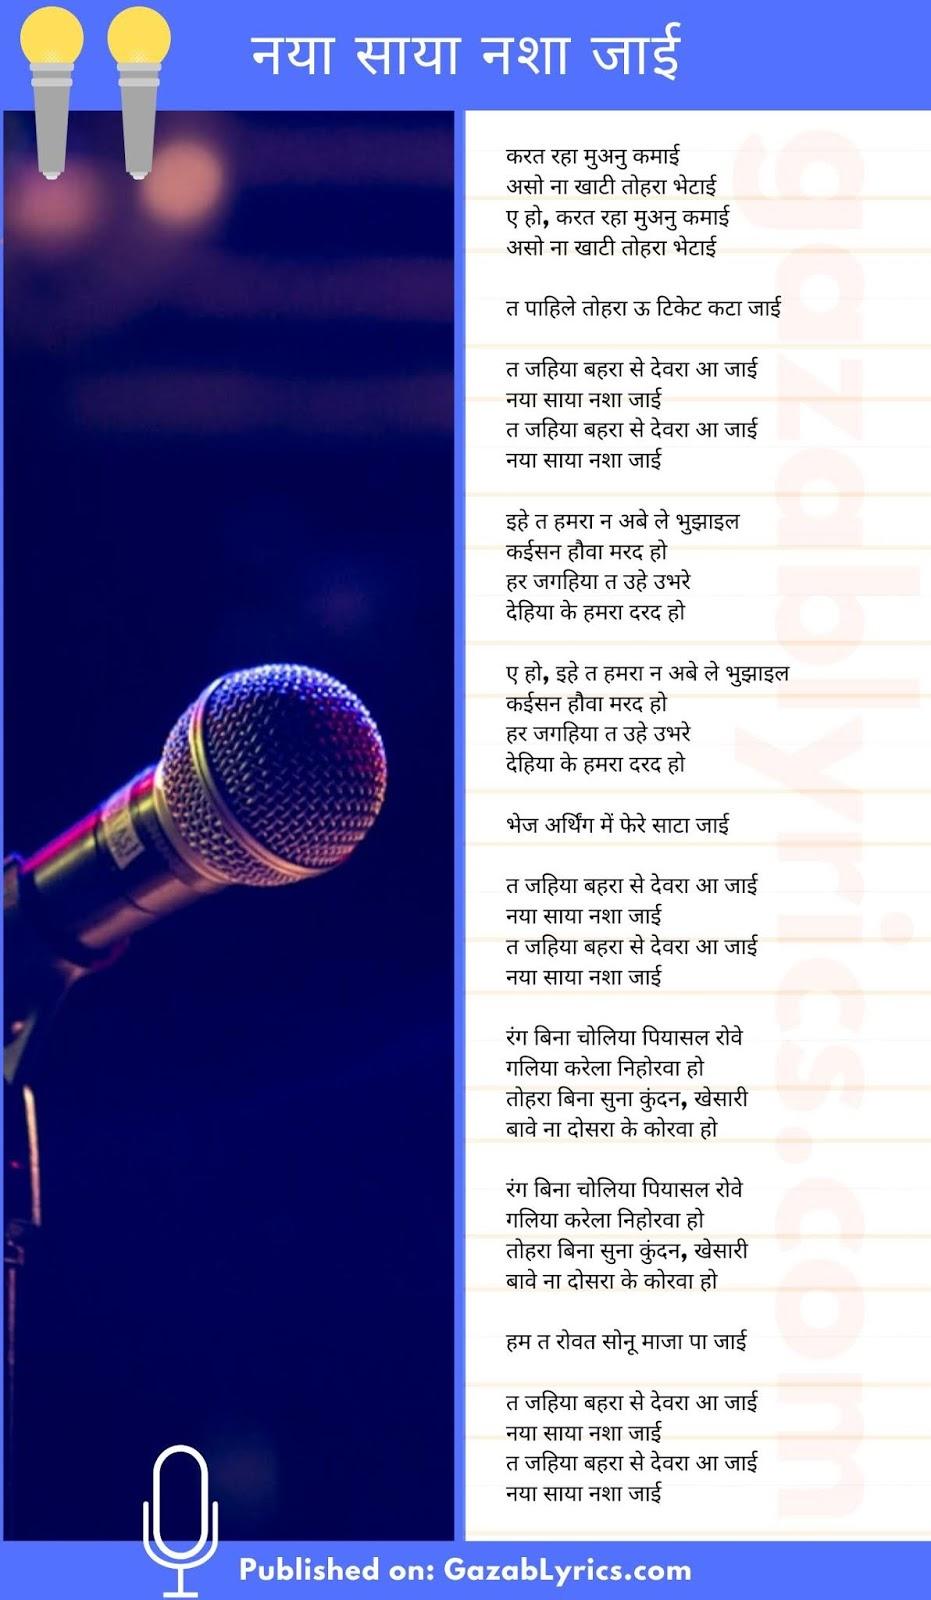 Naya Saya Nasha Jai song lyrics image